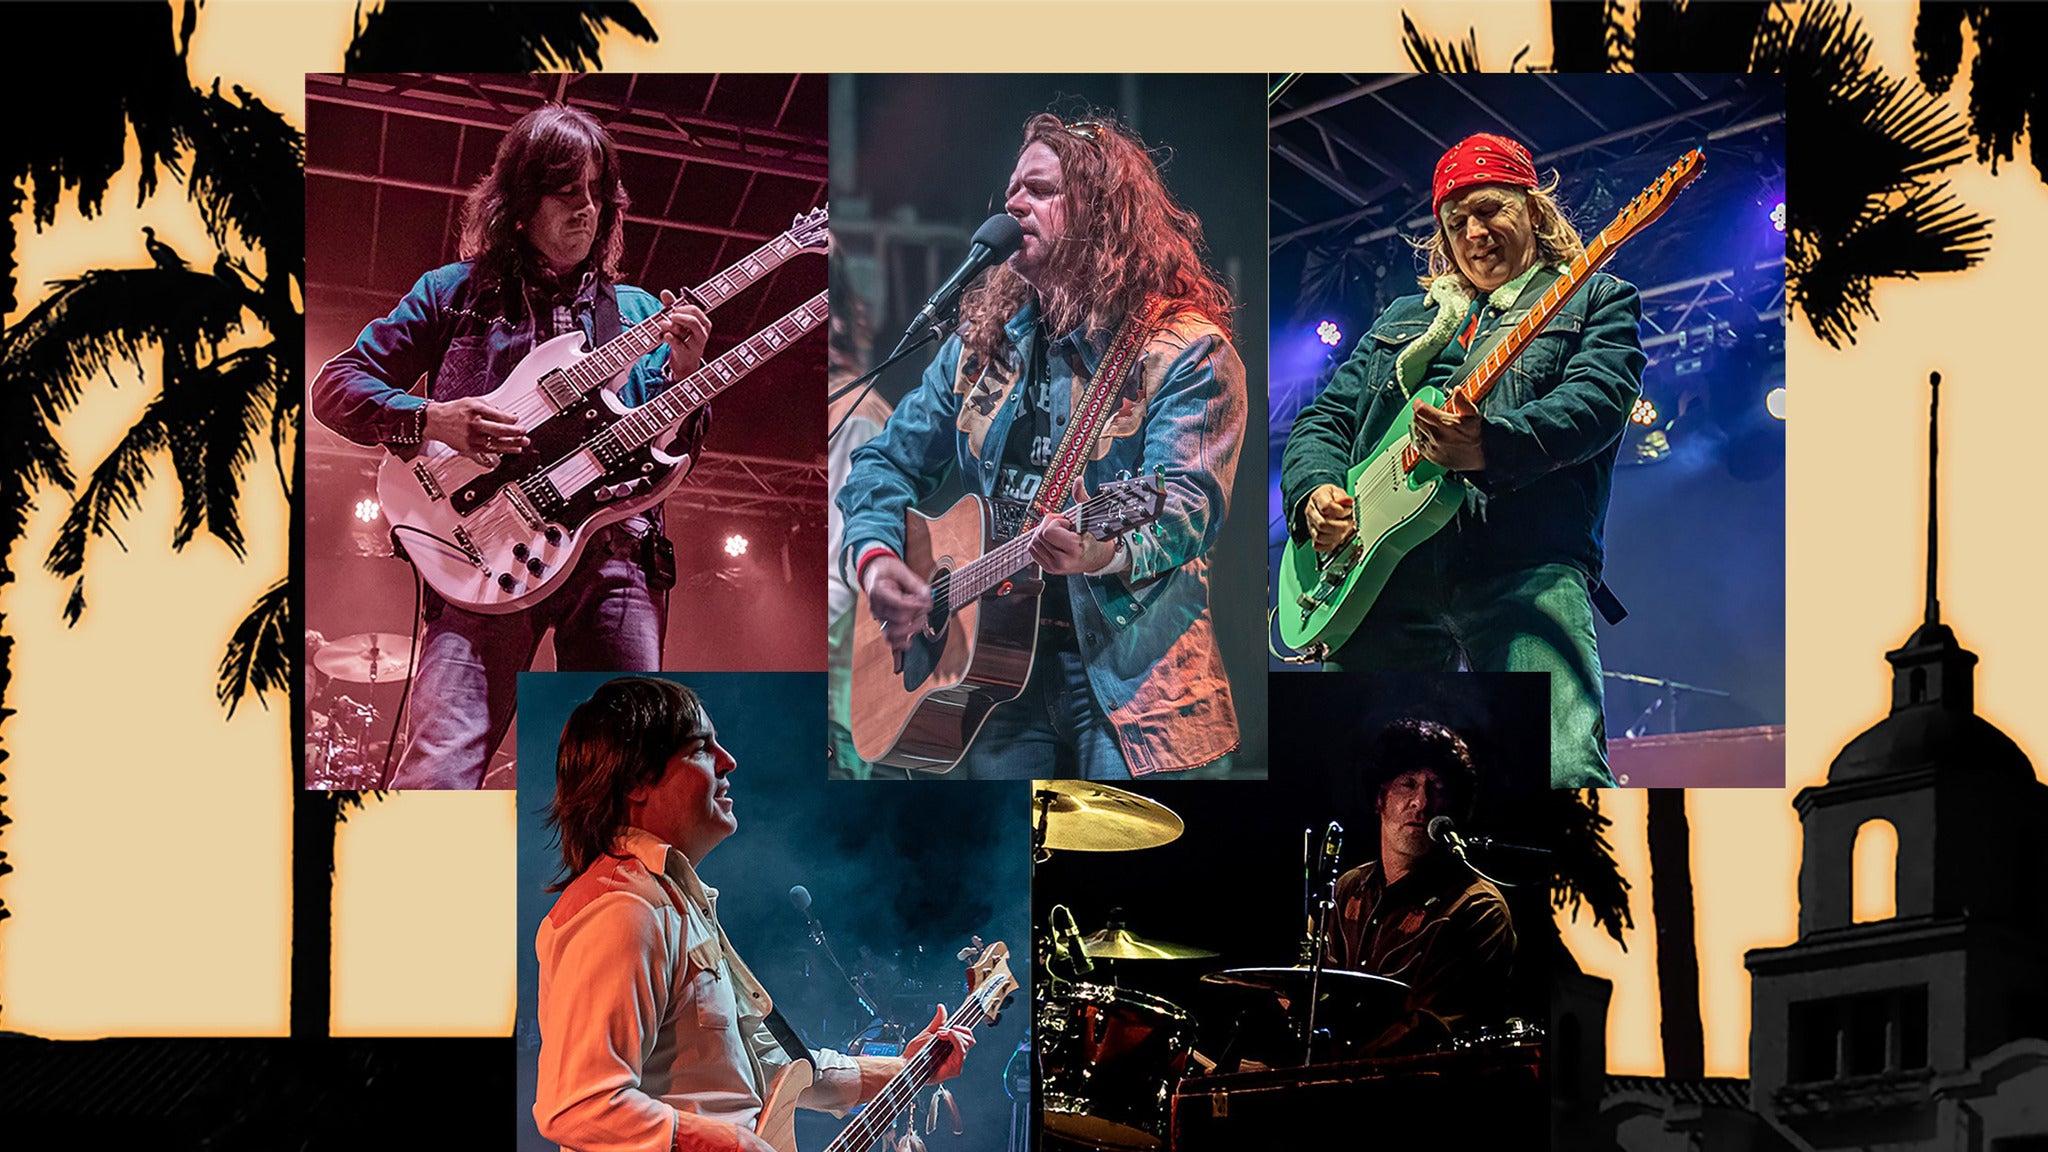 presale code for Dark Desert Eagles tickets in Salisbury - MA (Blue Ocean Music Hall)